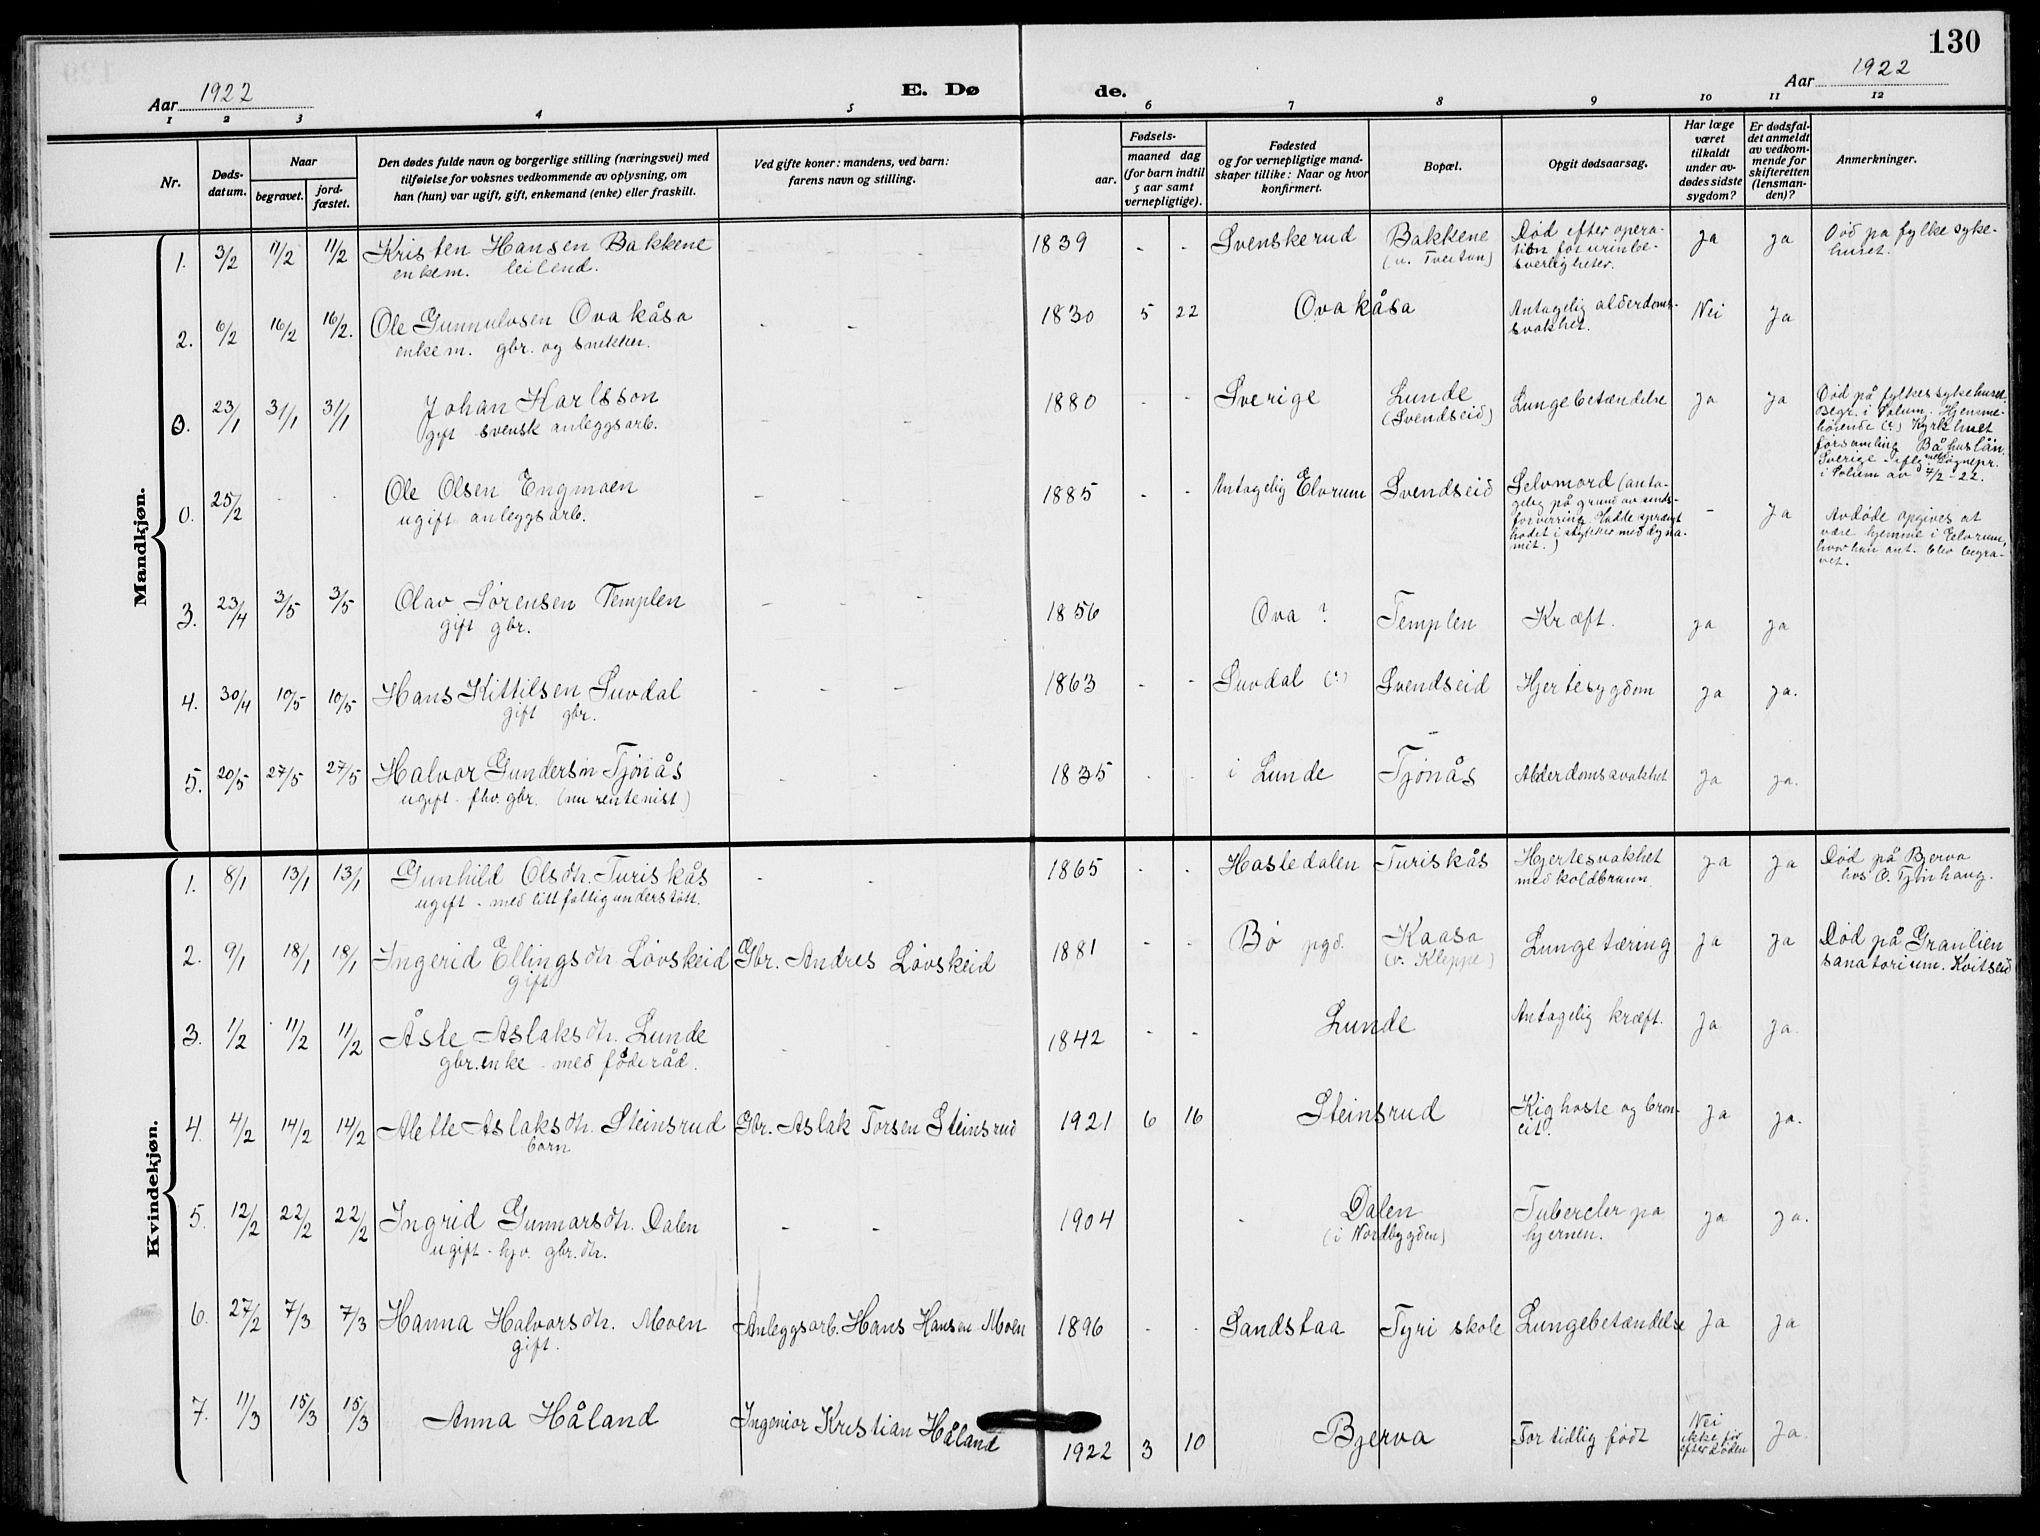 SAKO, Lunde kirkebøker, F/Fa/L0005: Ministerialbok nr. I 5, 1914-1922, s. 130